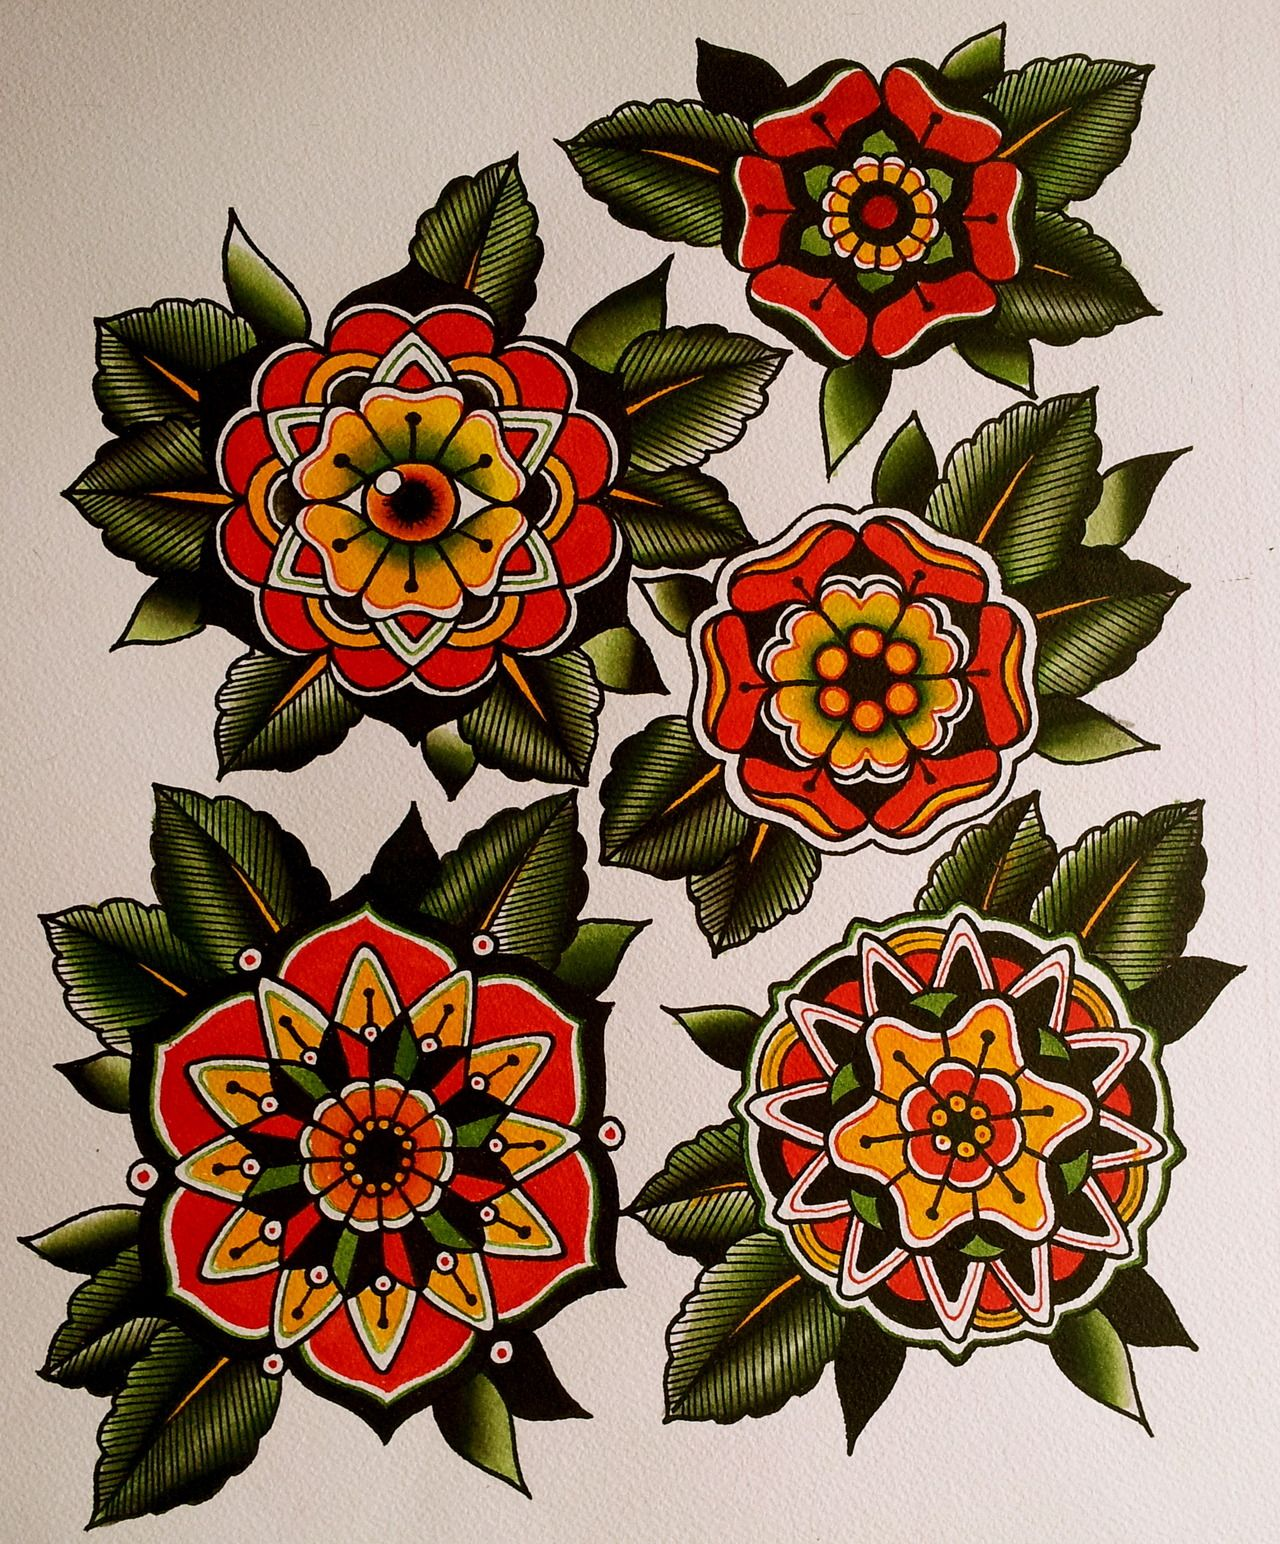 traditionalrawb mandala sheet I painted last night Ink Pinterest